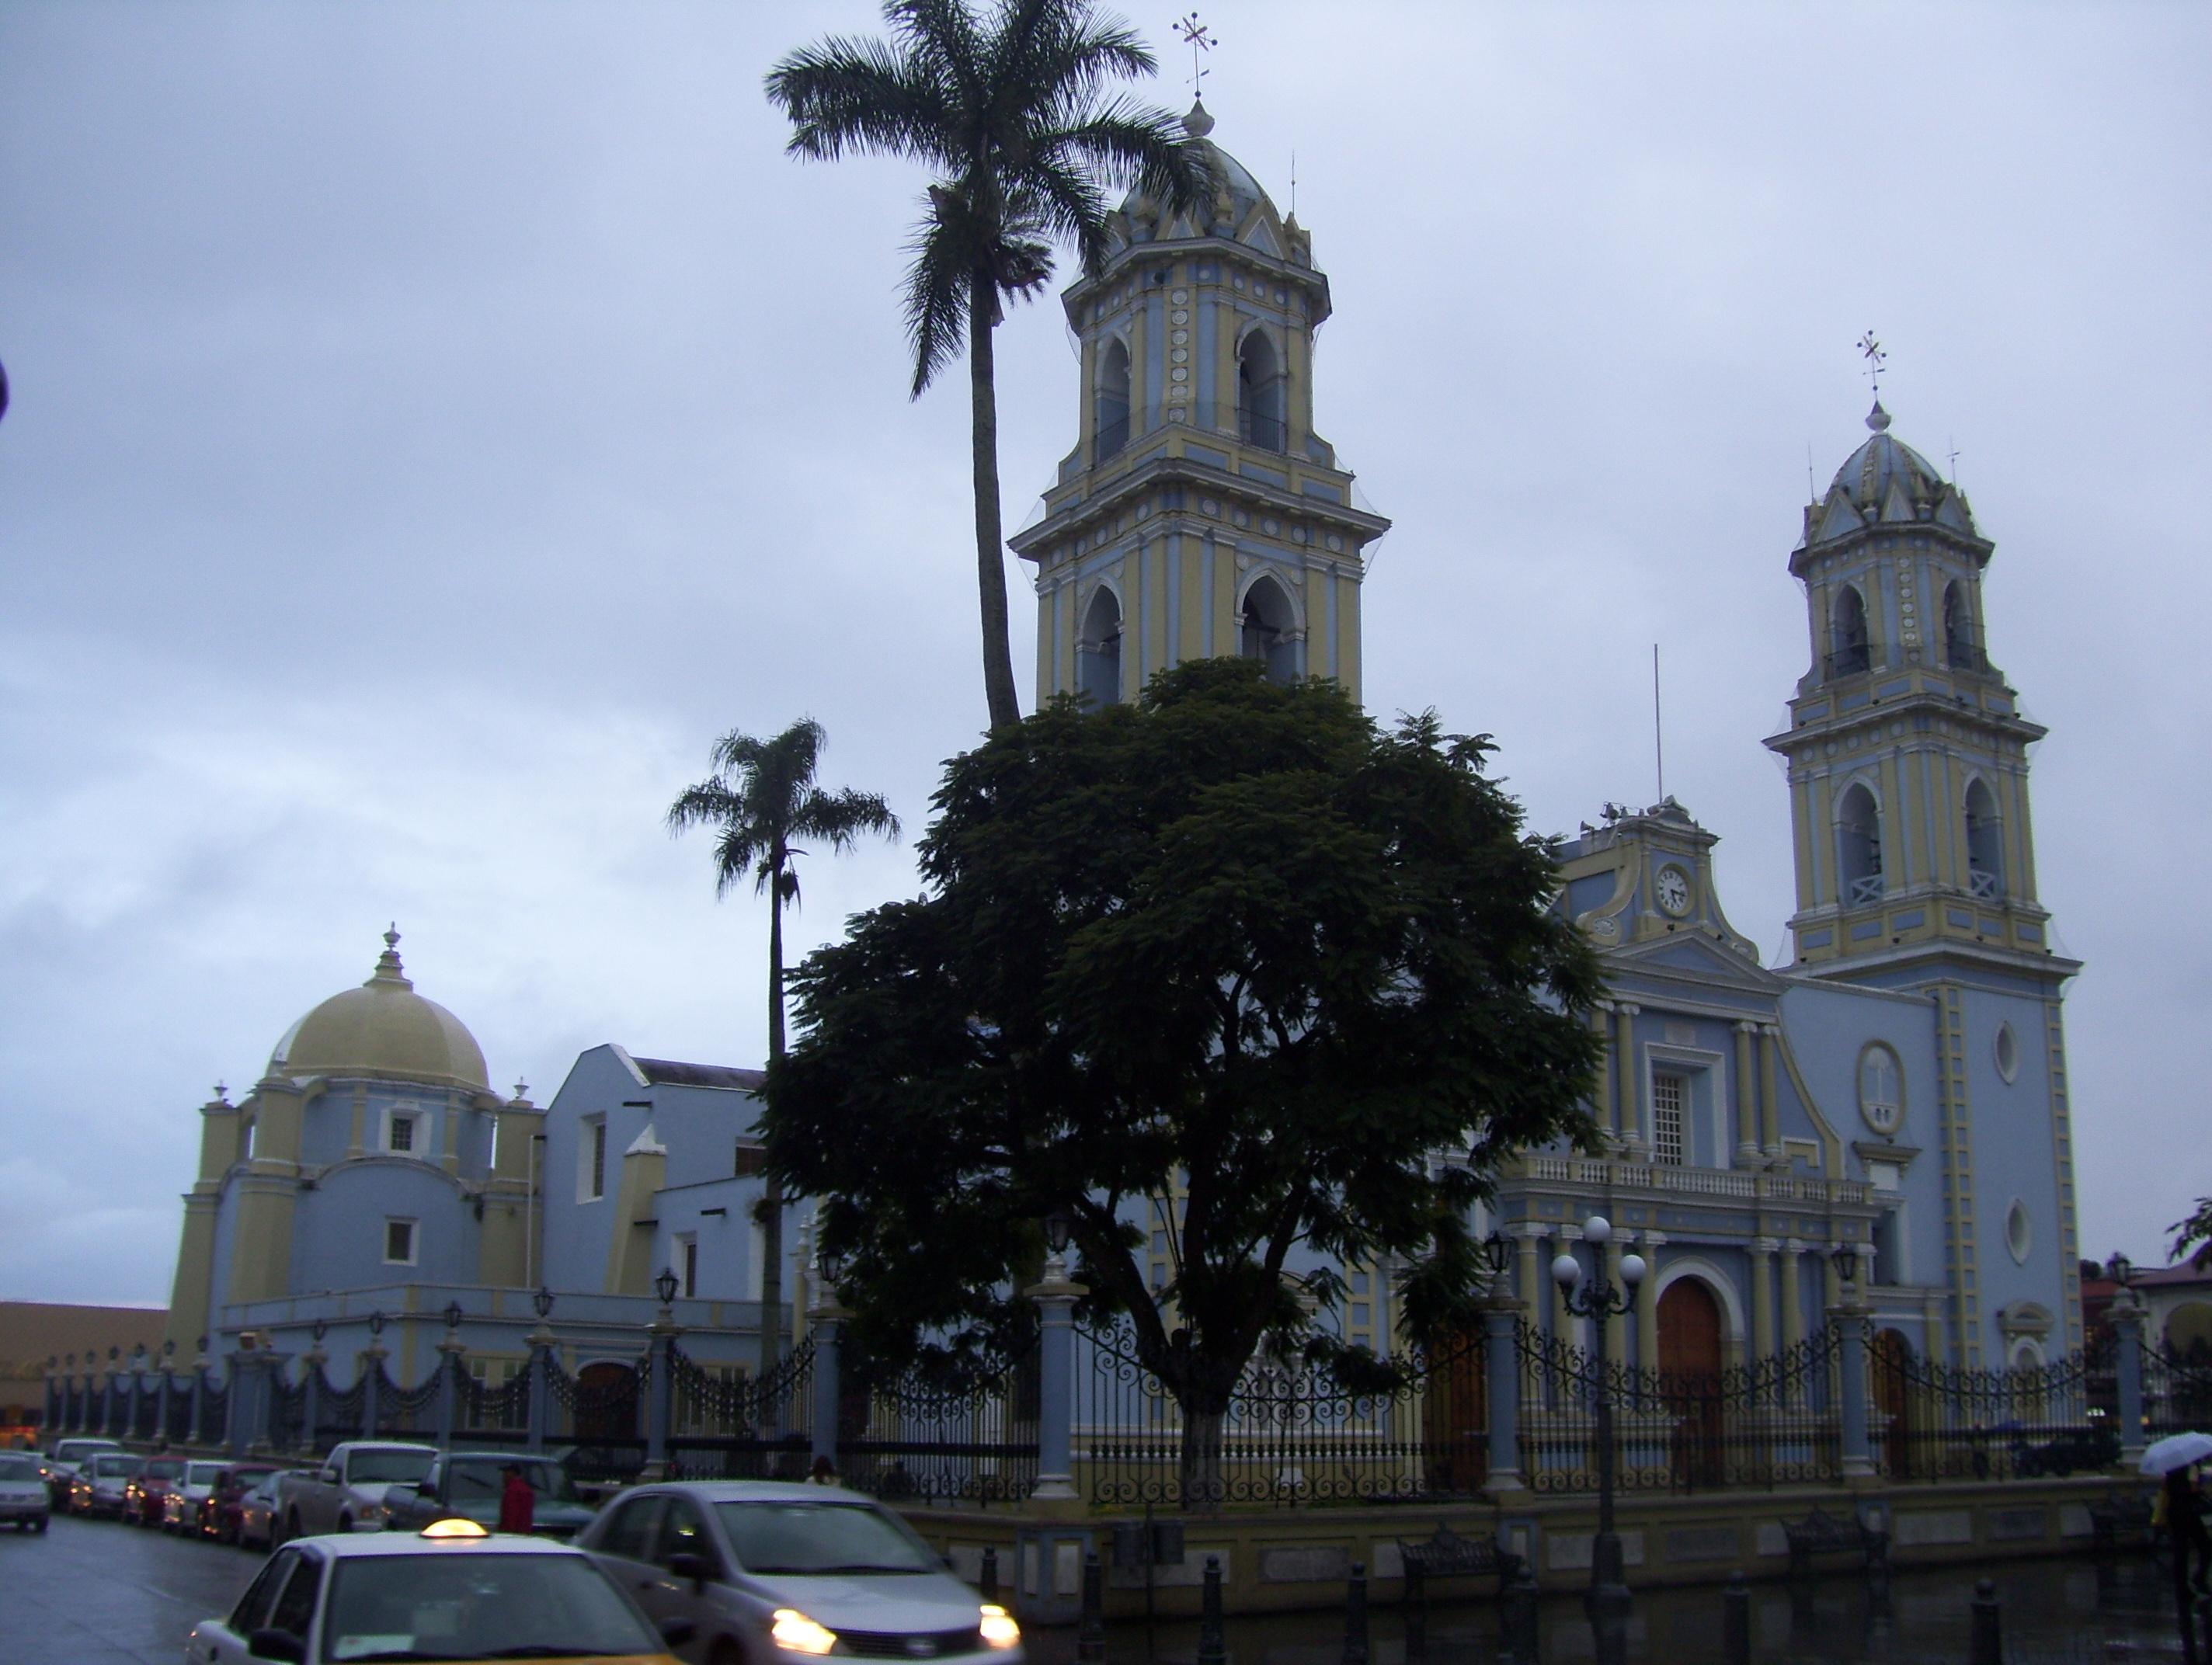 And so we arrive to Córdoba, Veracruz